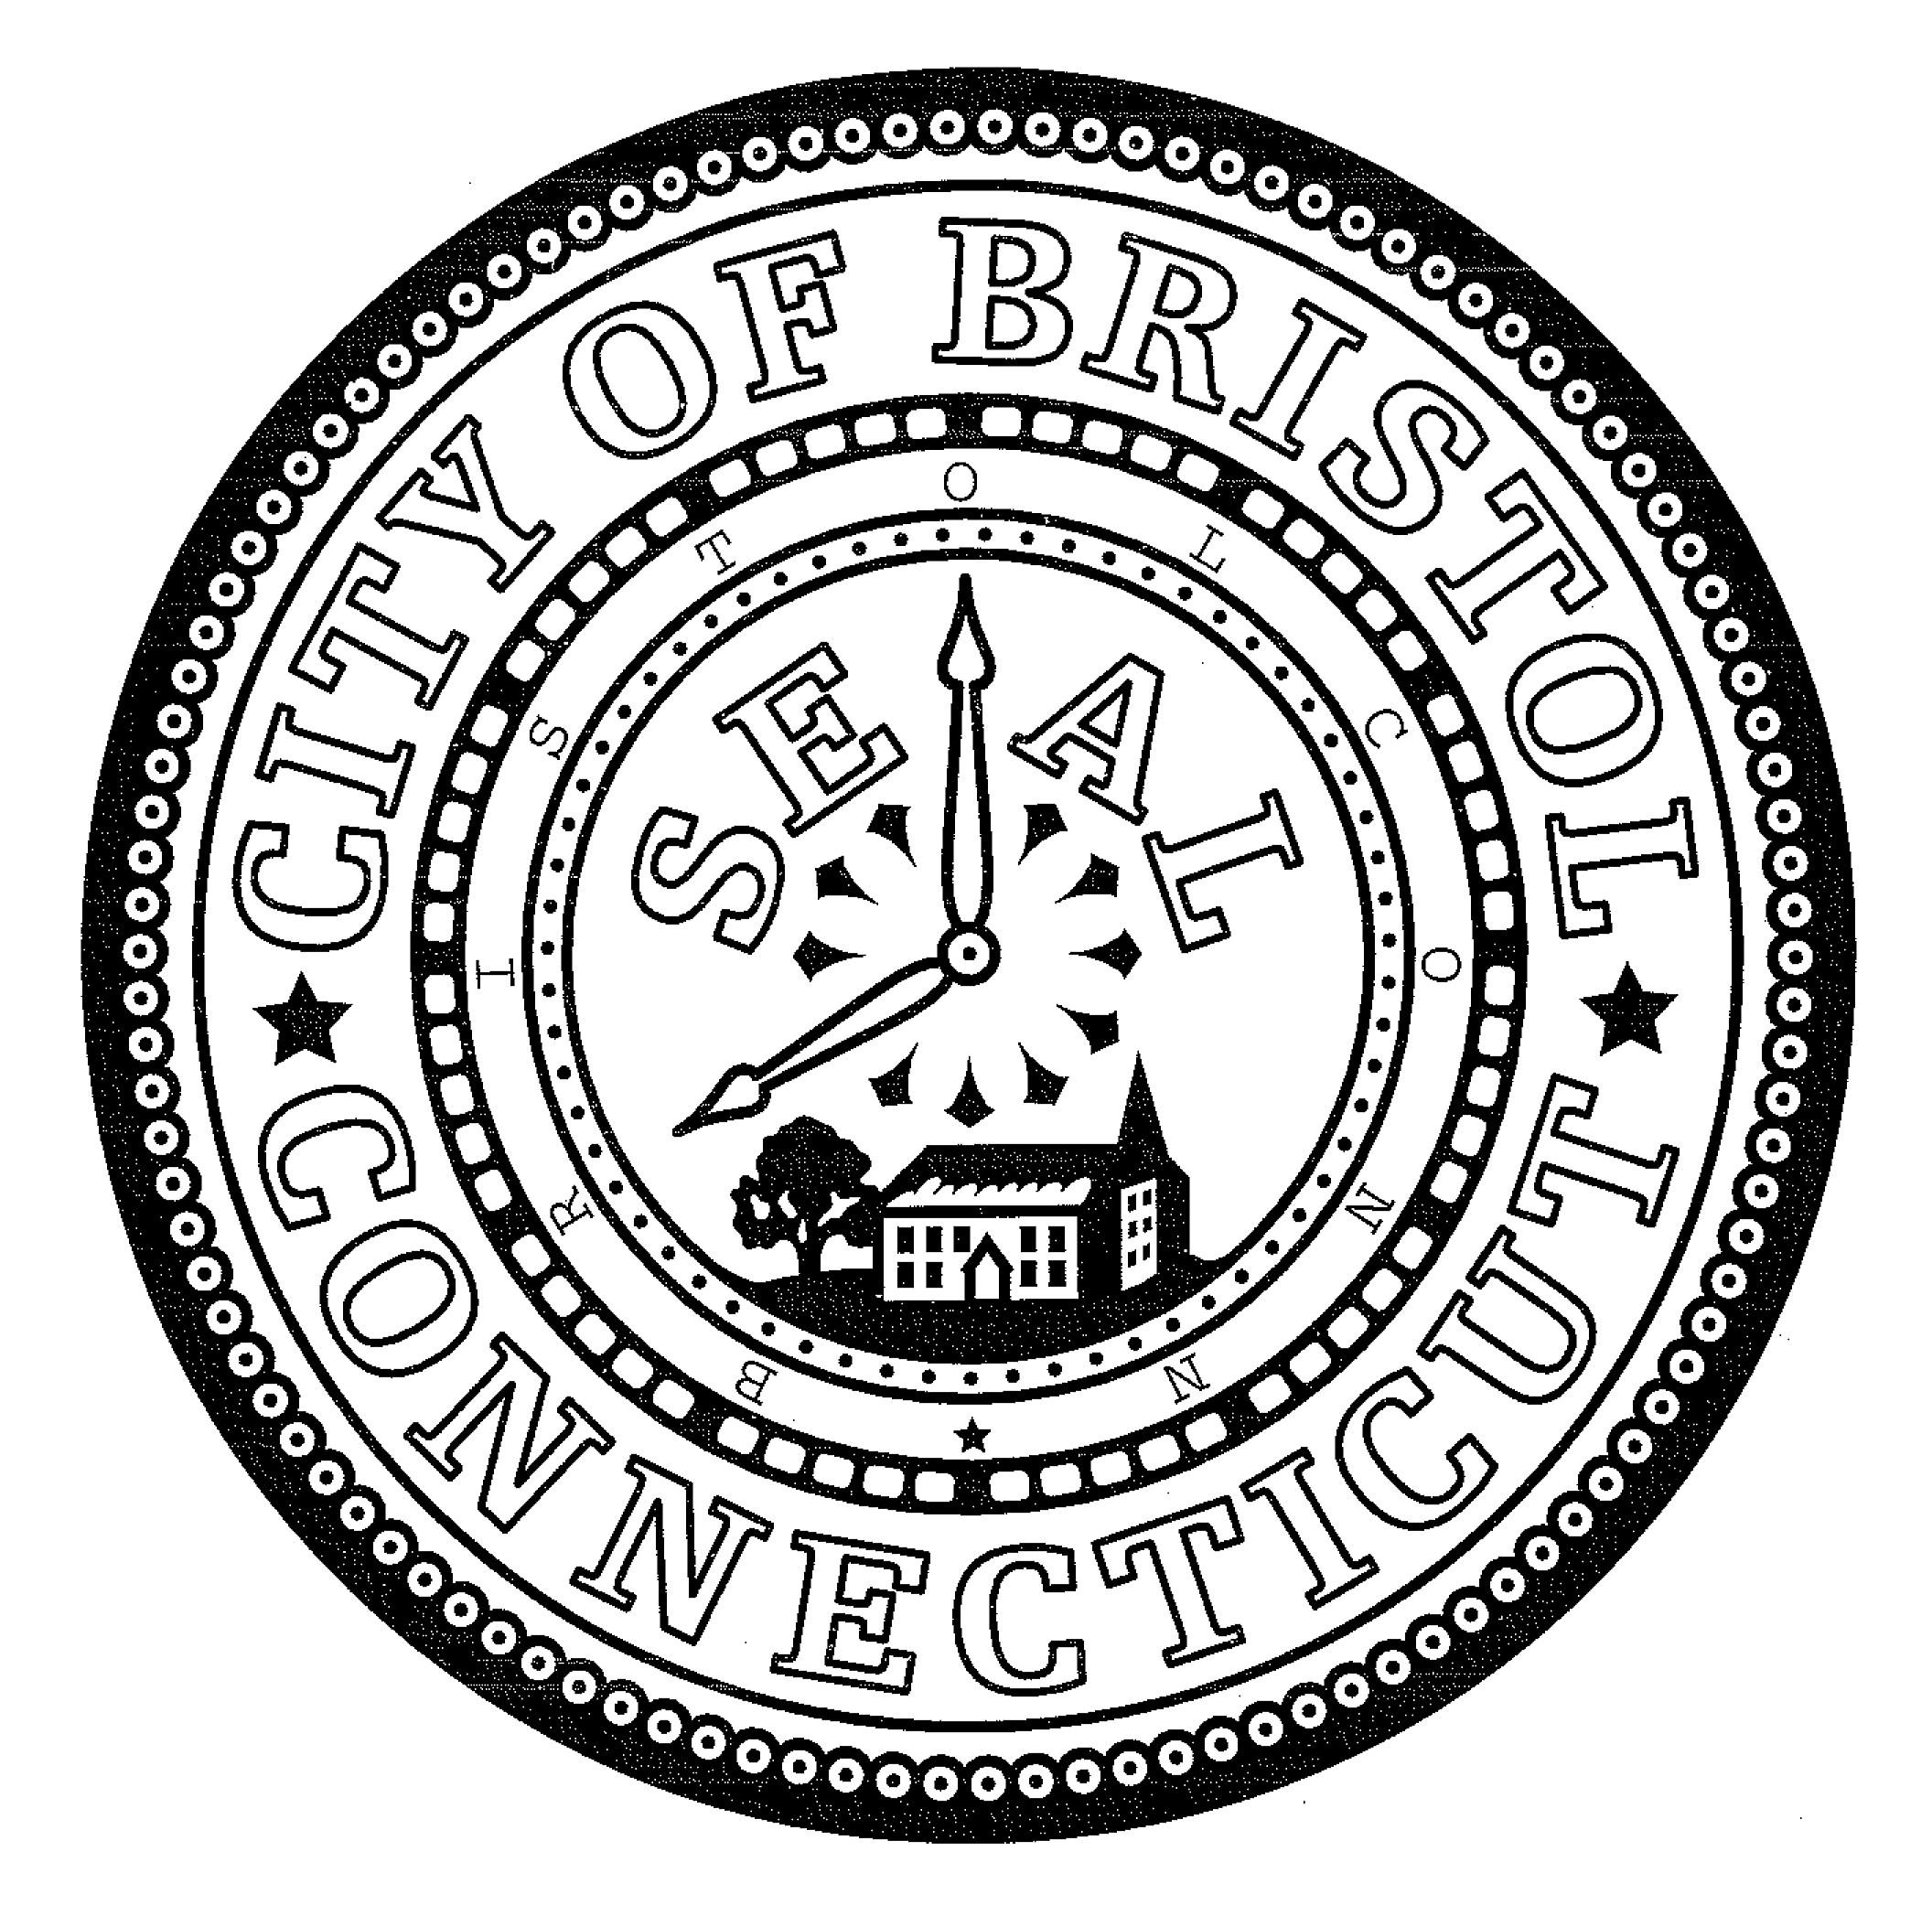 City of Bristol